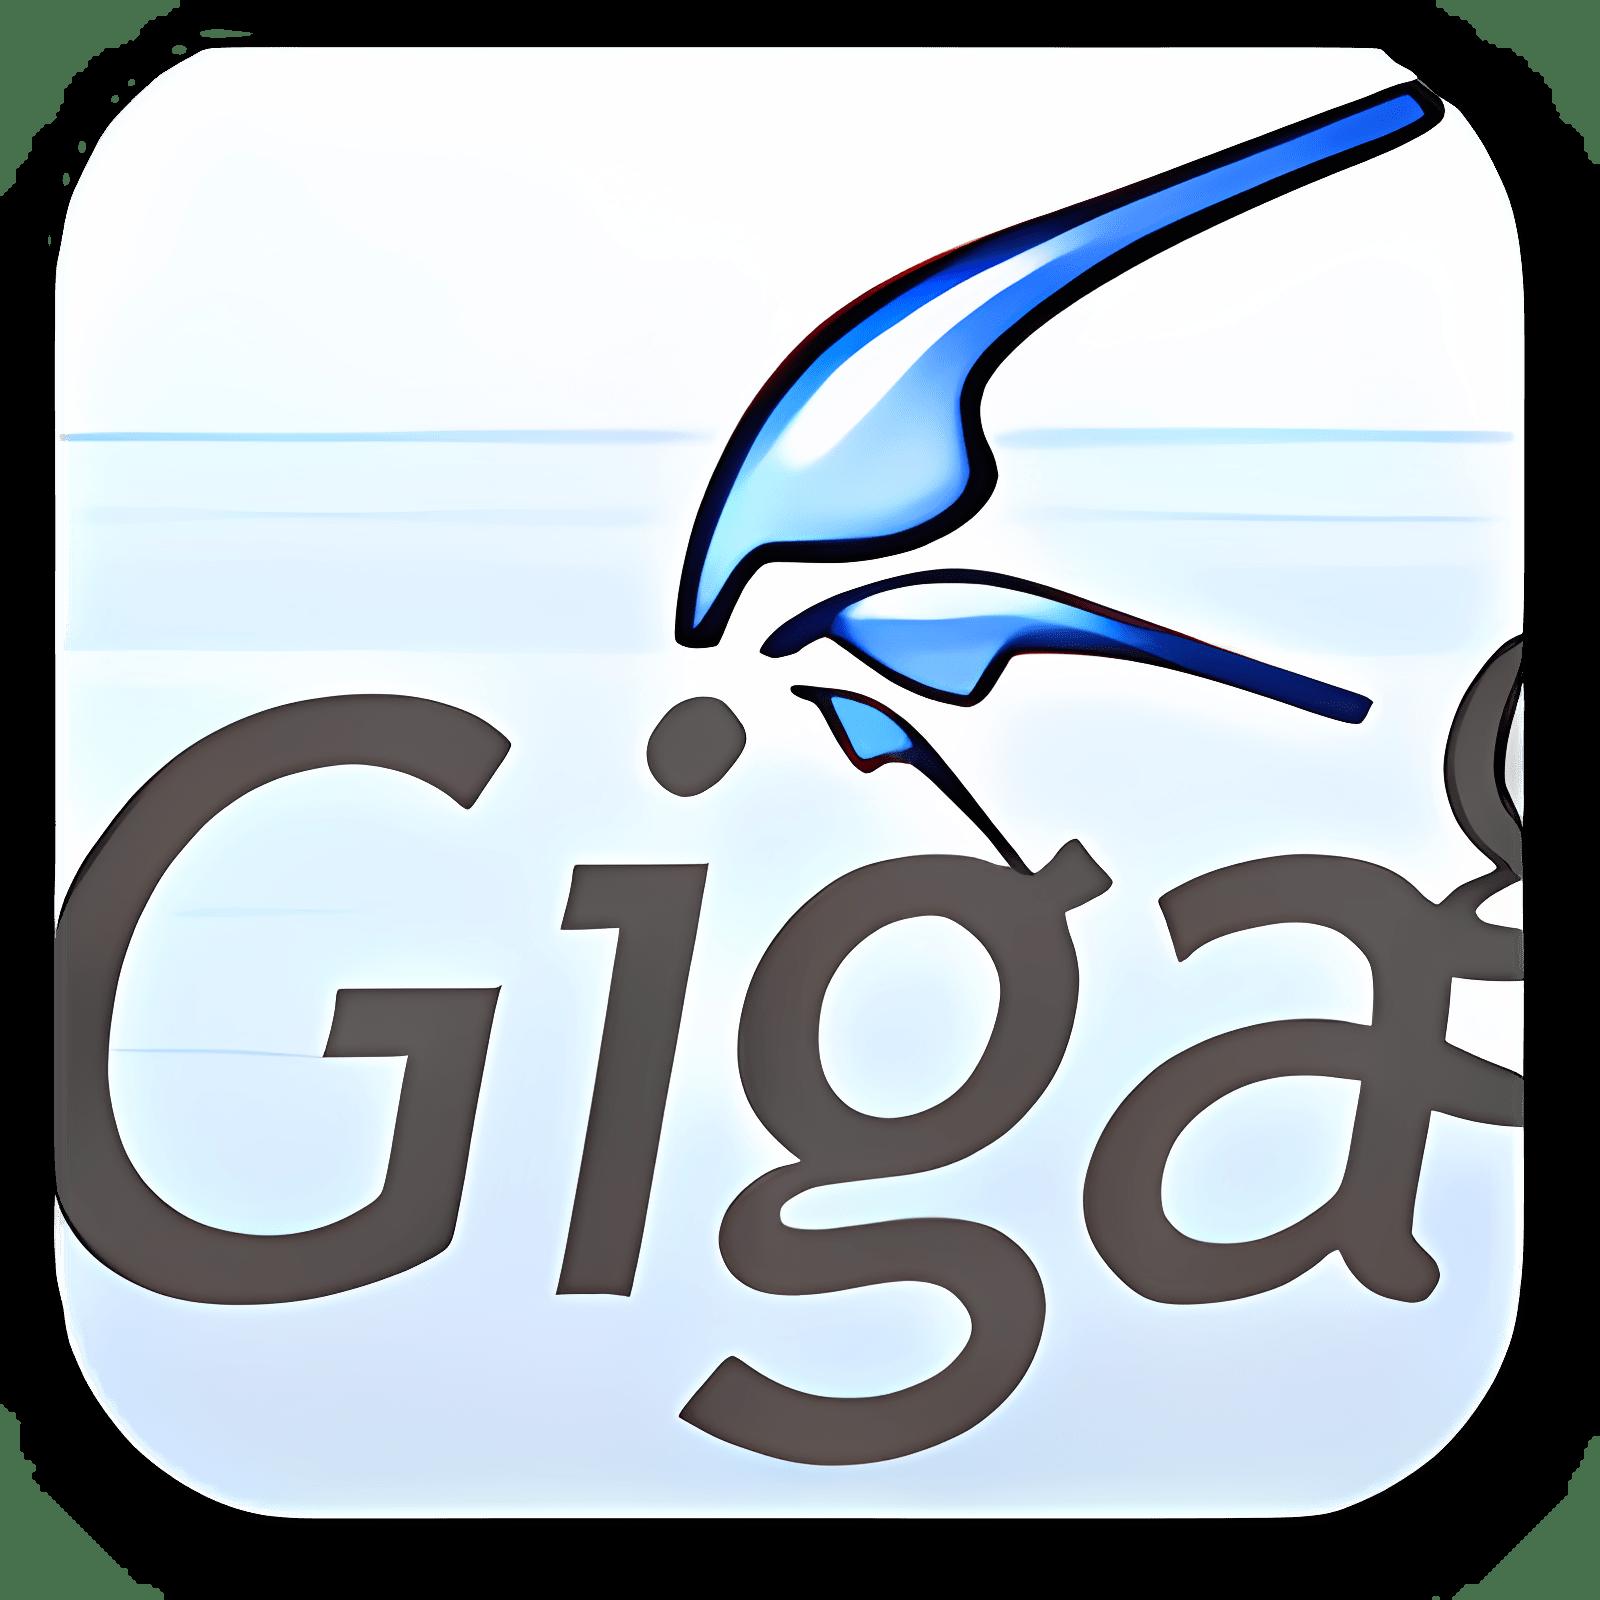 GigaGet